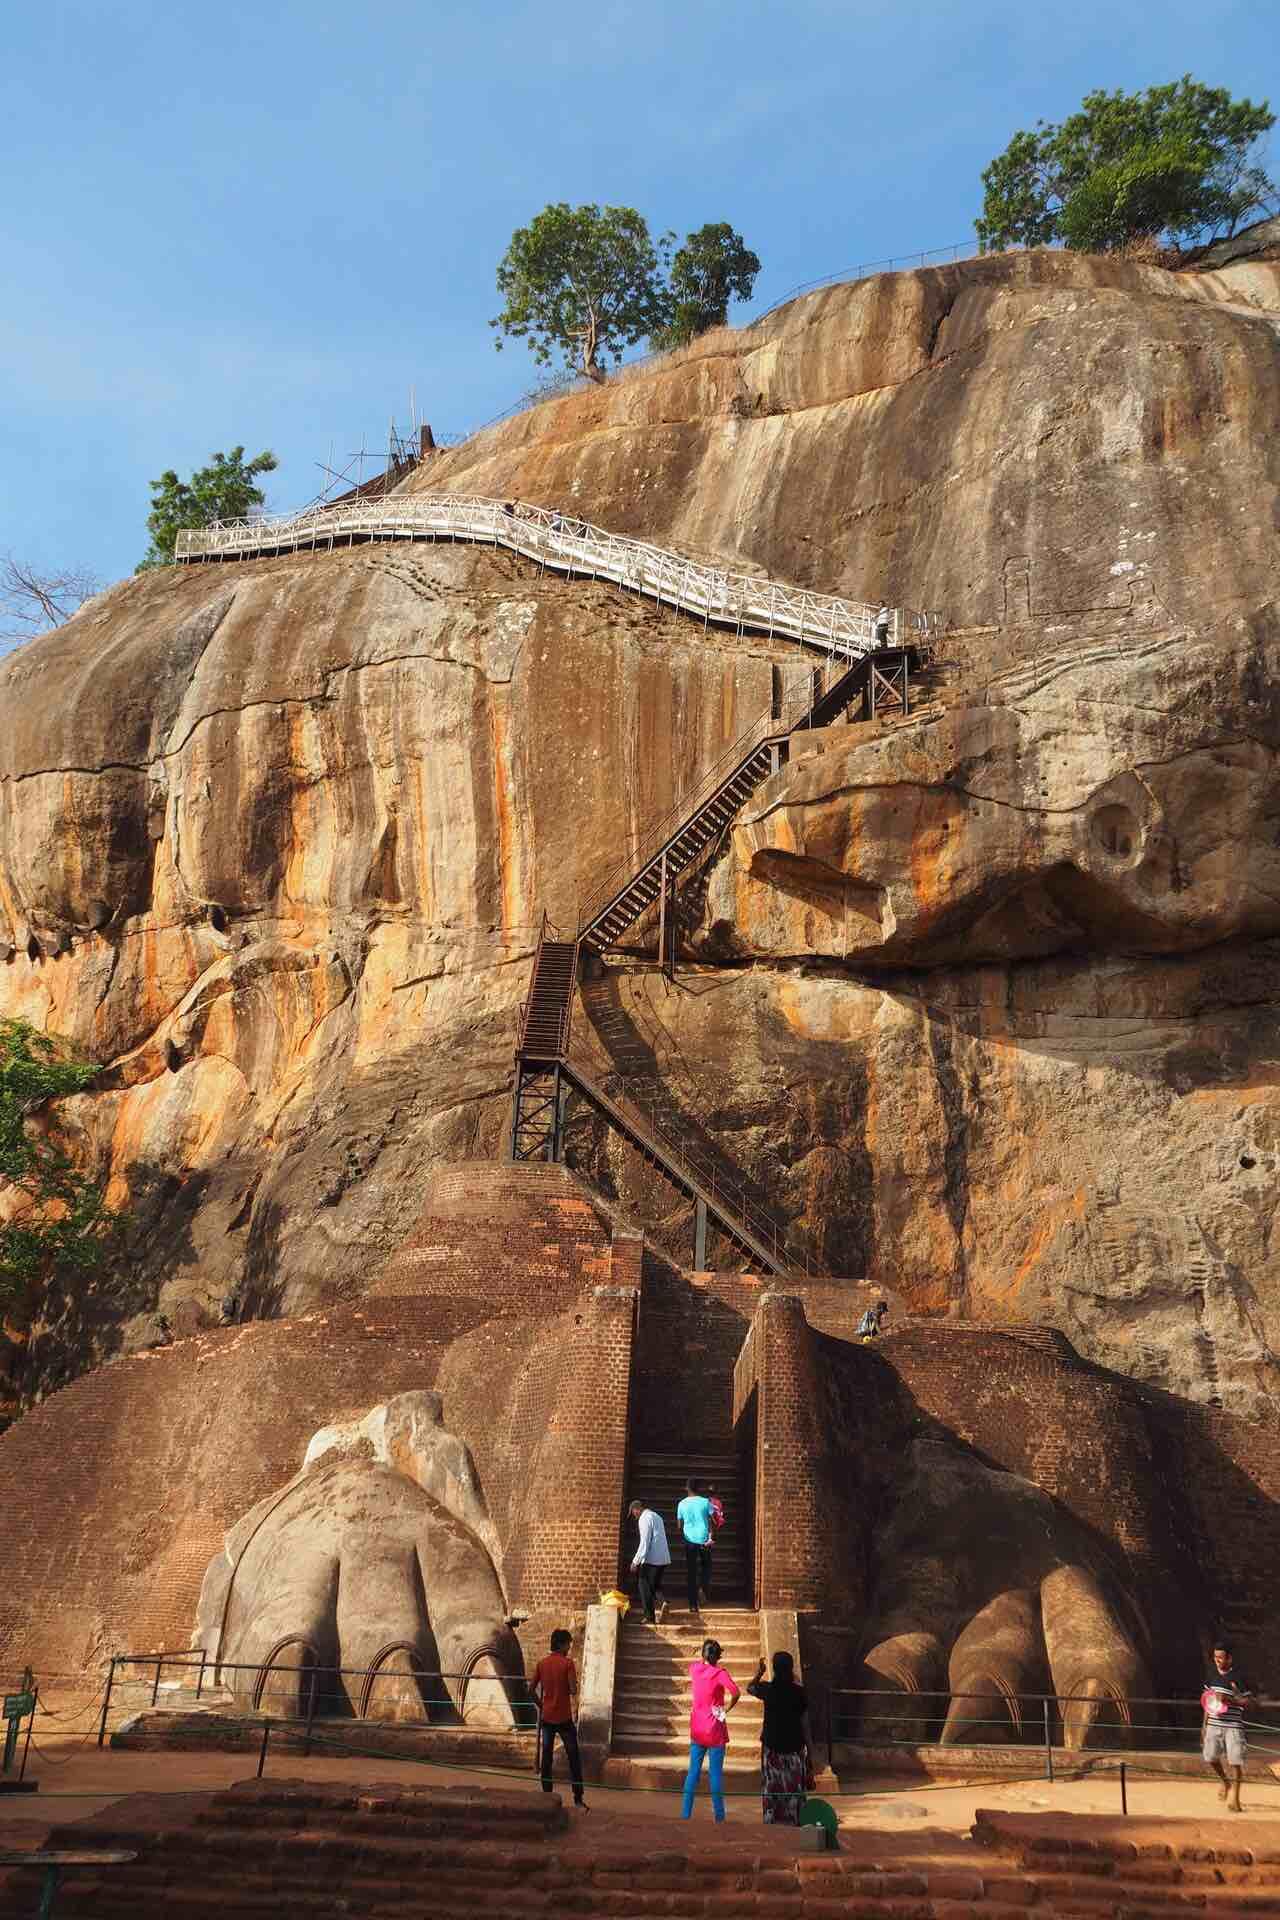 sri-lanka-sigiriya-holiday-review-feedback-invite-to-paradise-quentin-kate-hulm.jpg